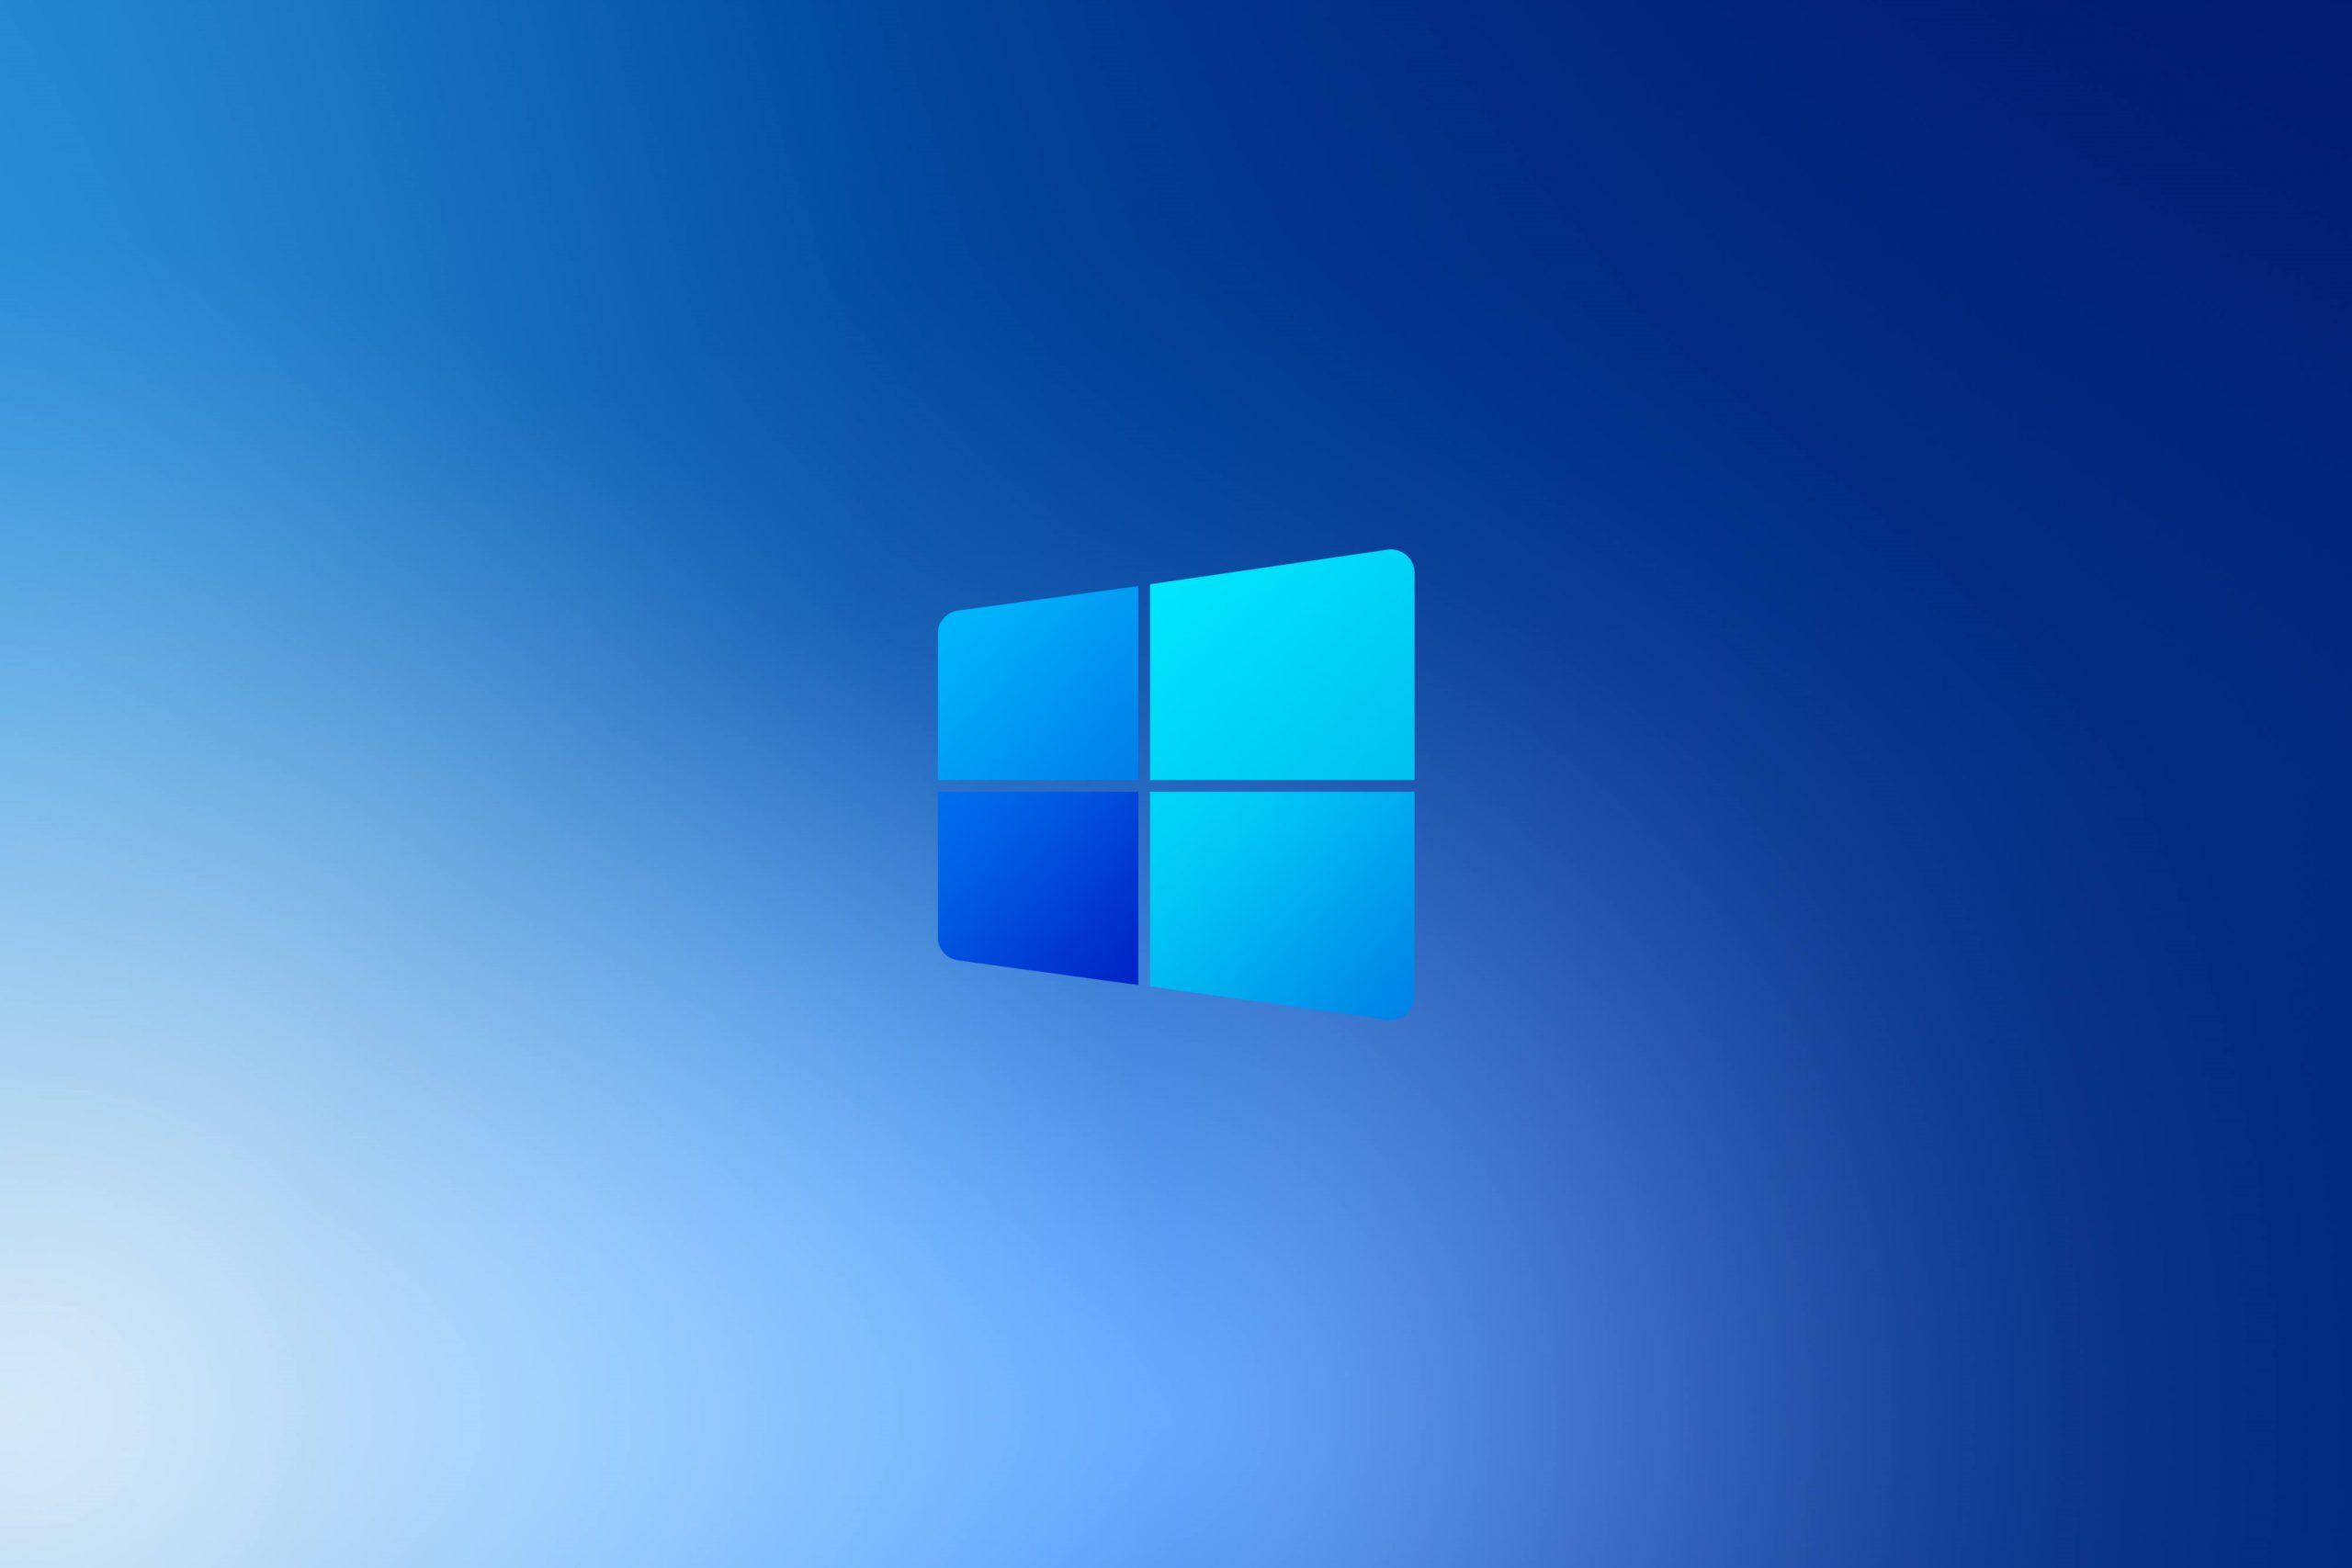 Windows 10x Backgrounds